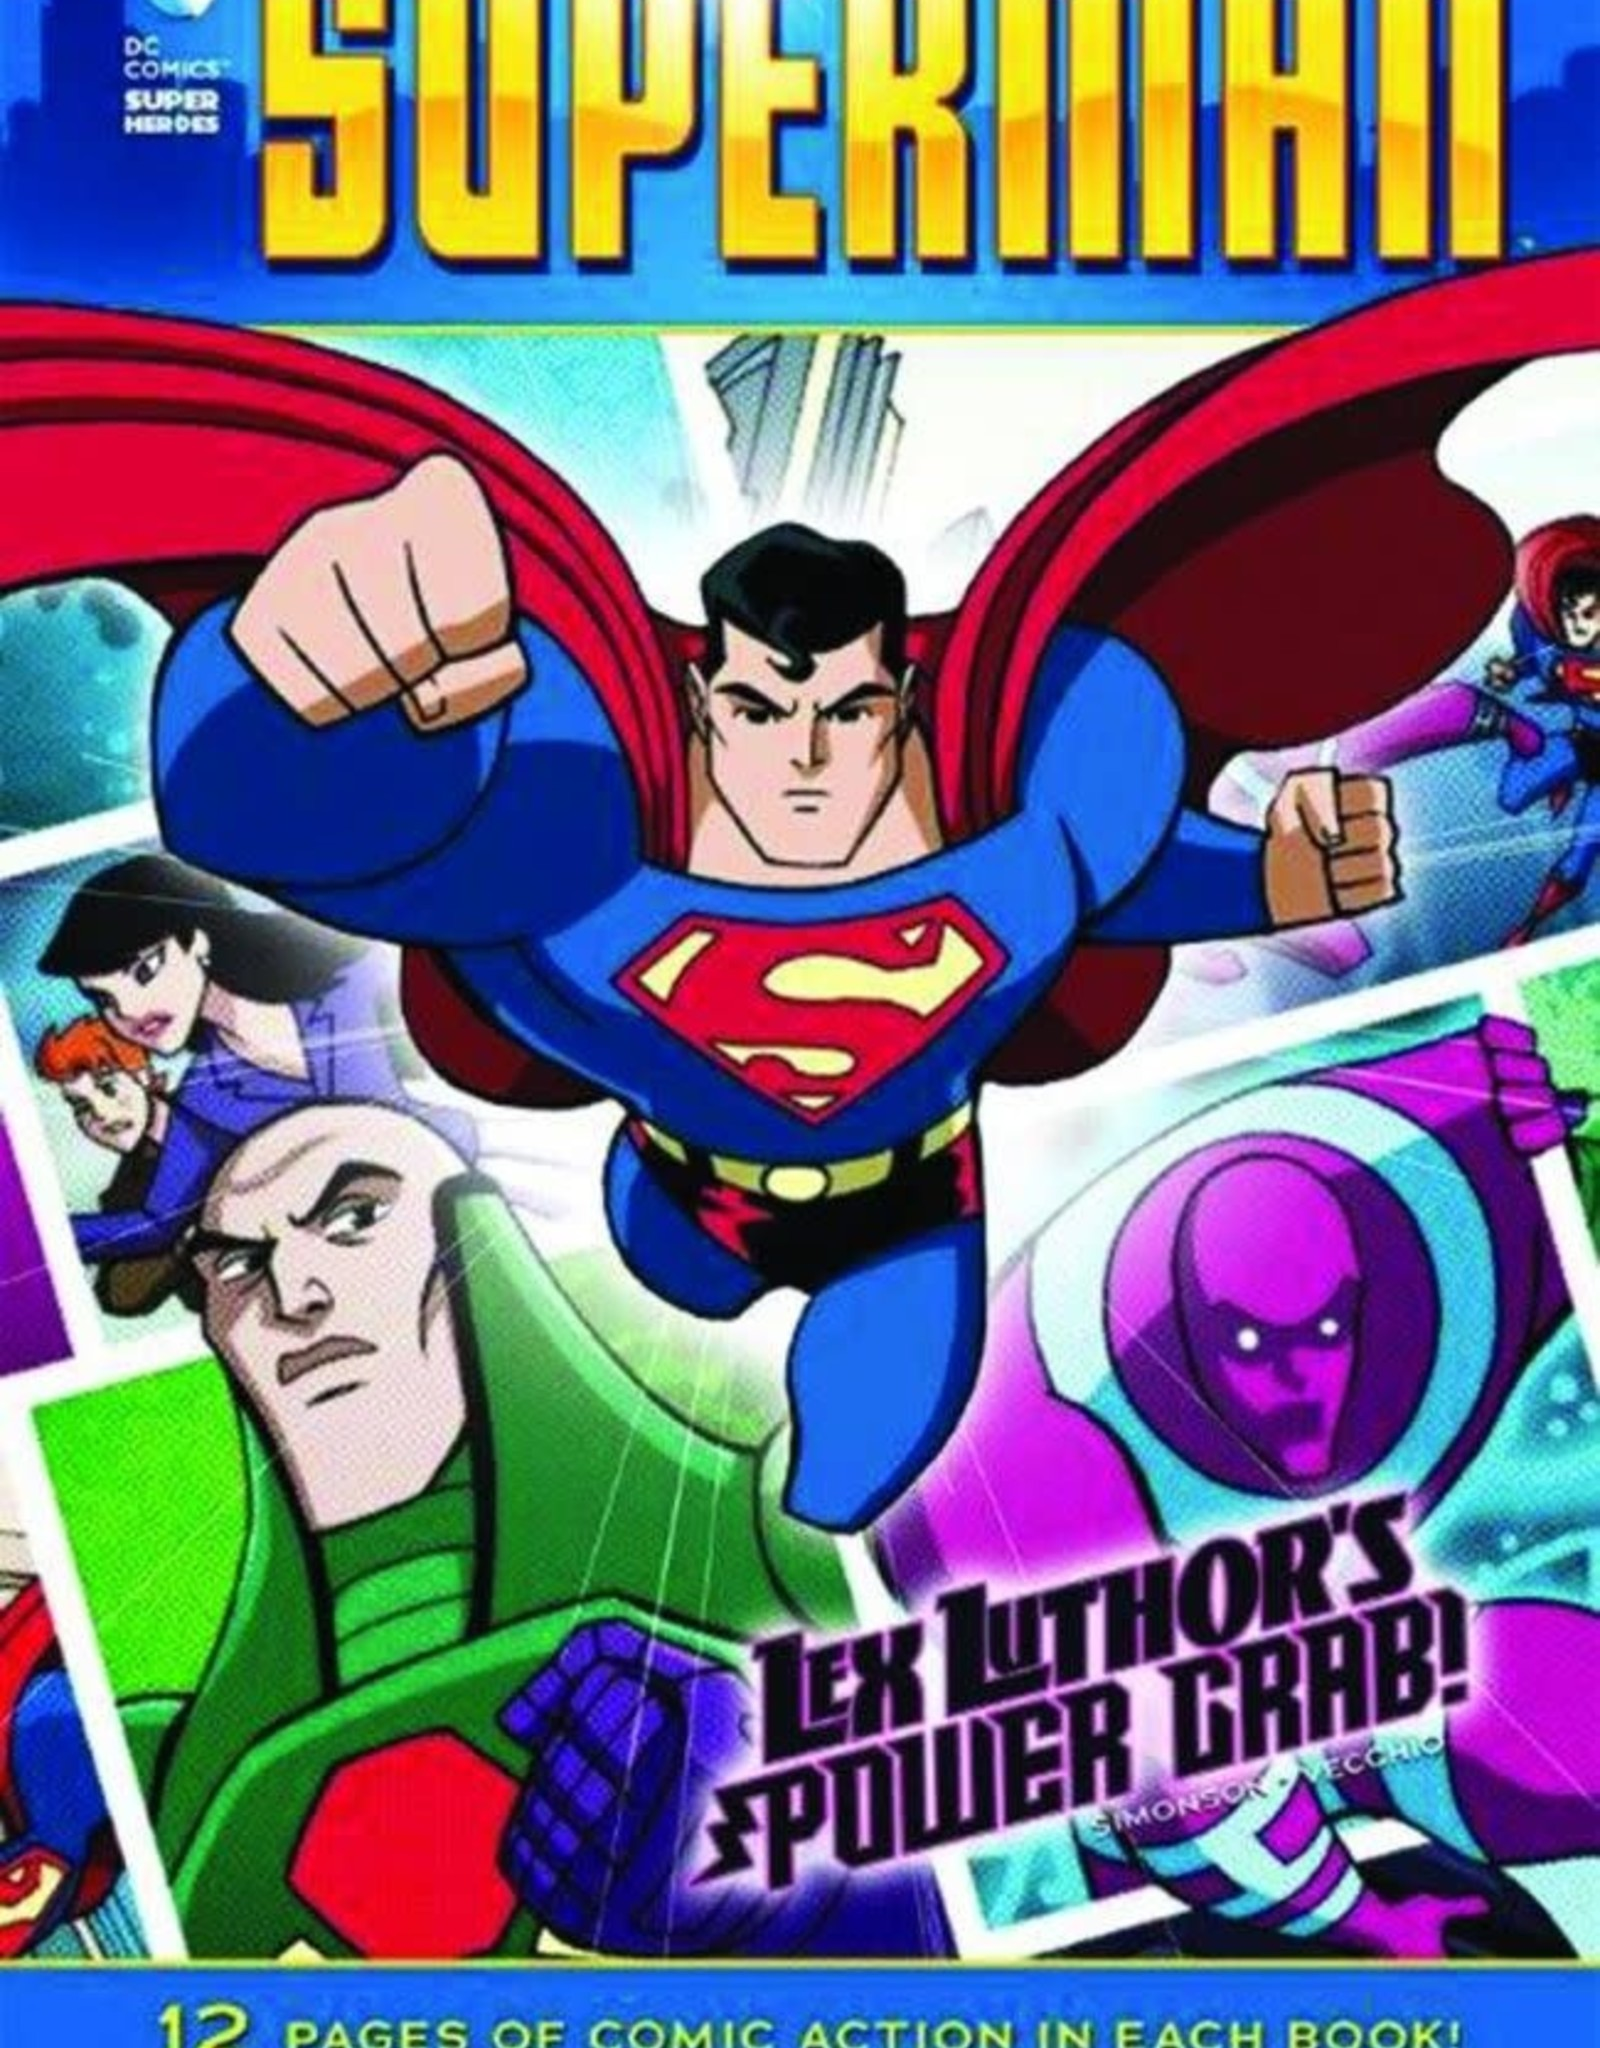 Capstone Publishing DC Super Heroes Superman Lex Luthor's Power Grab!